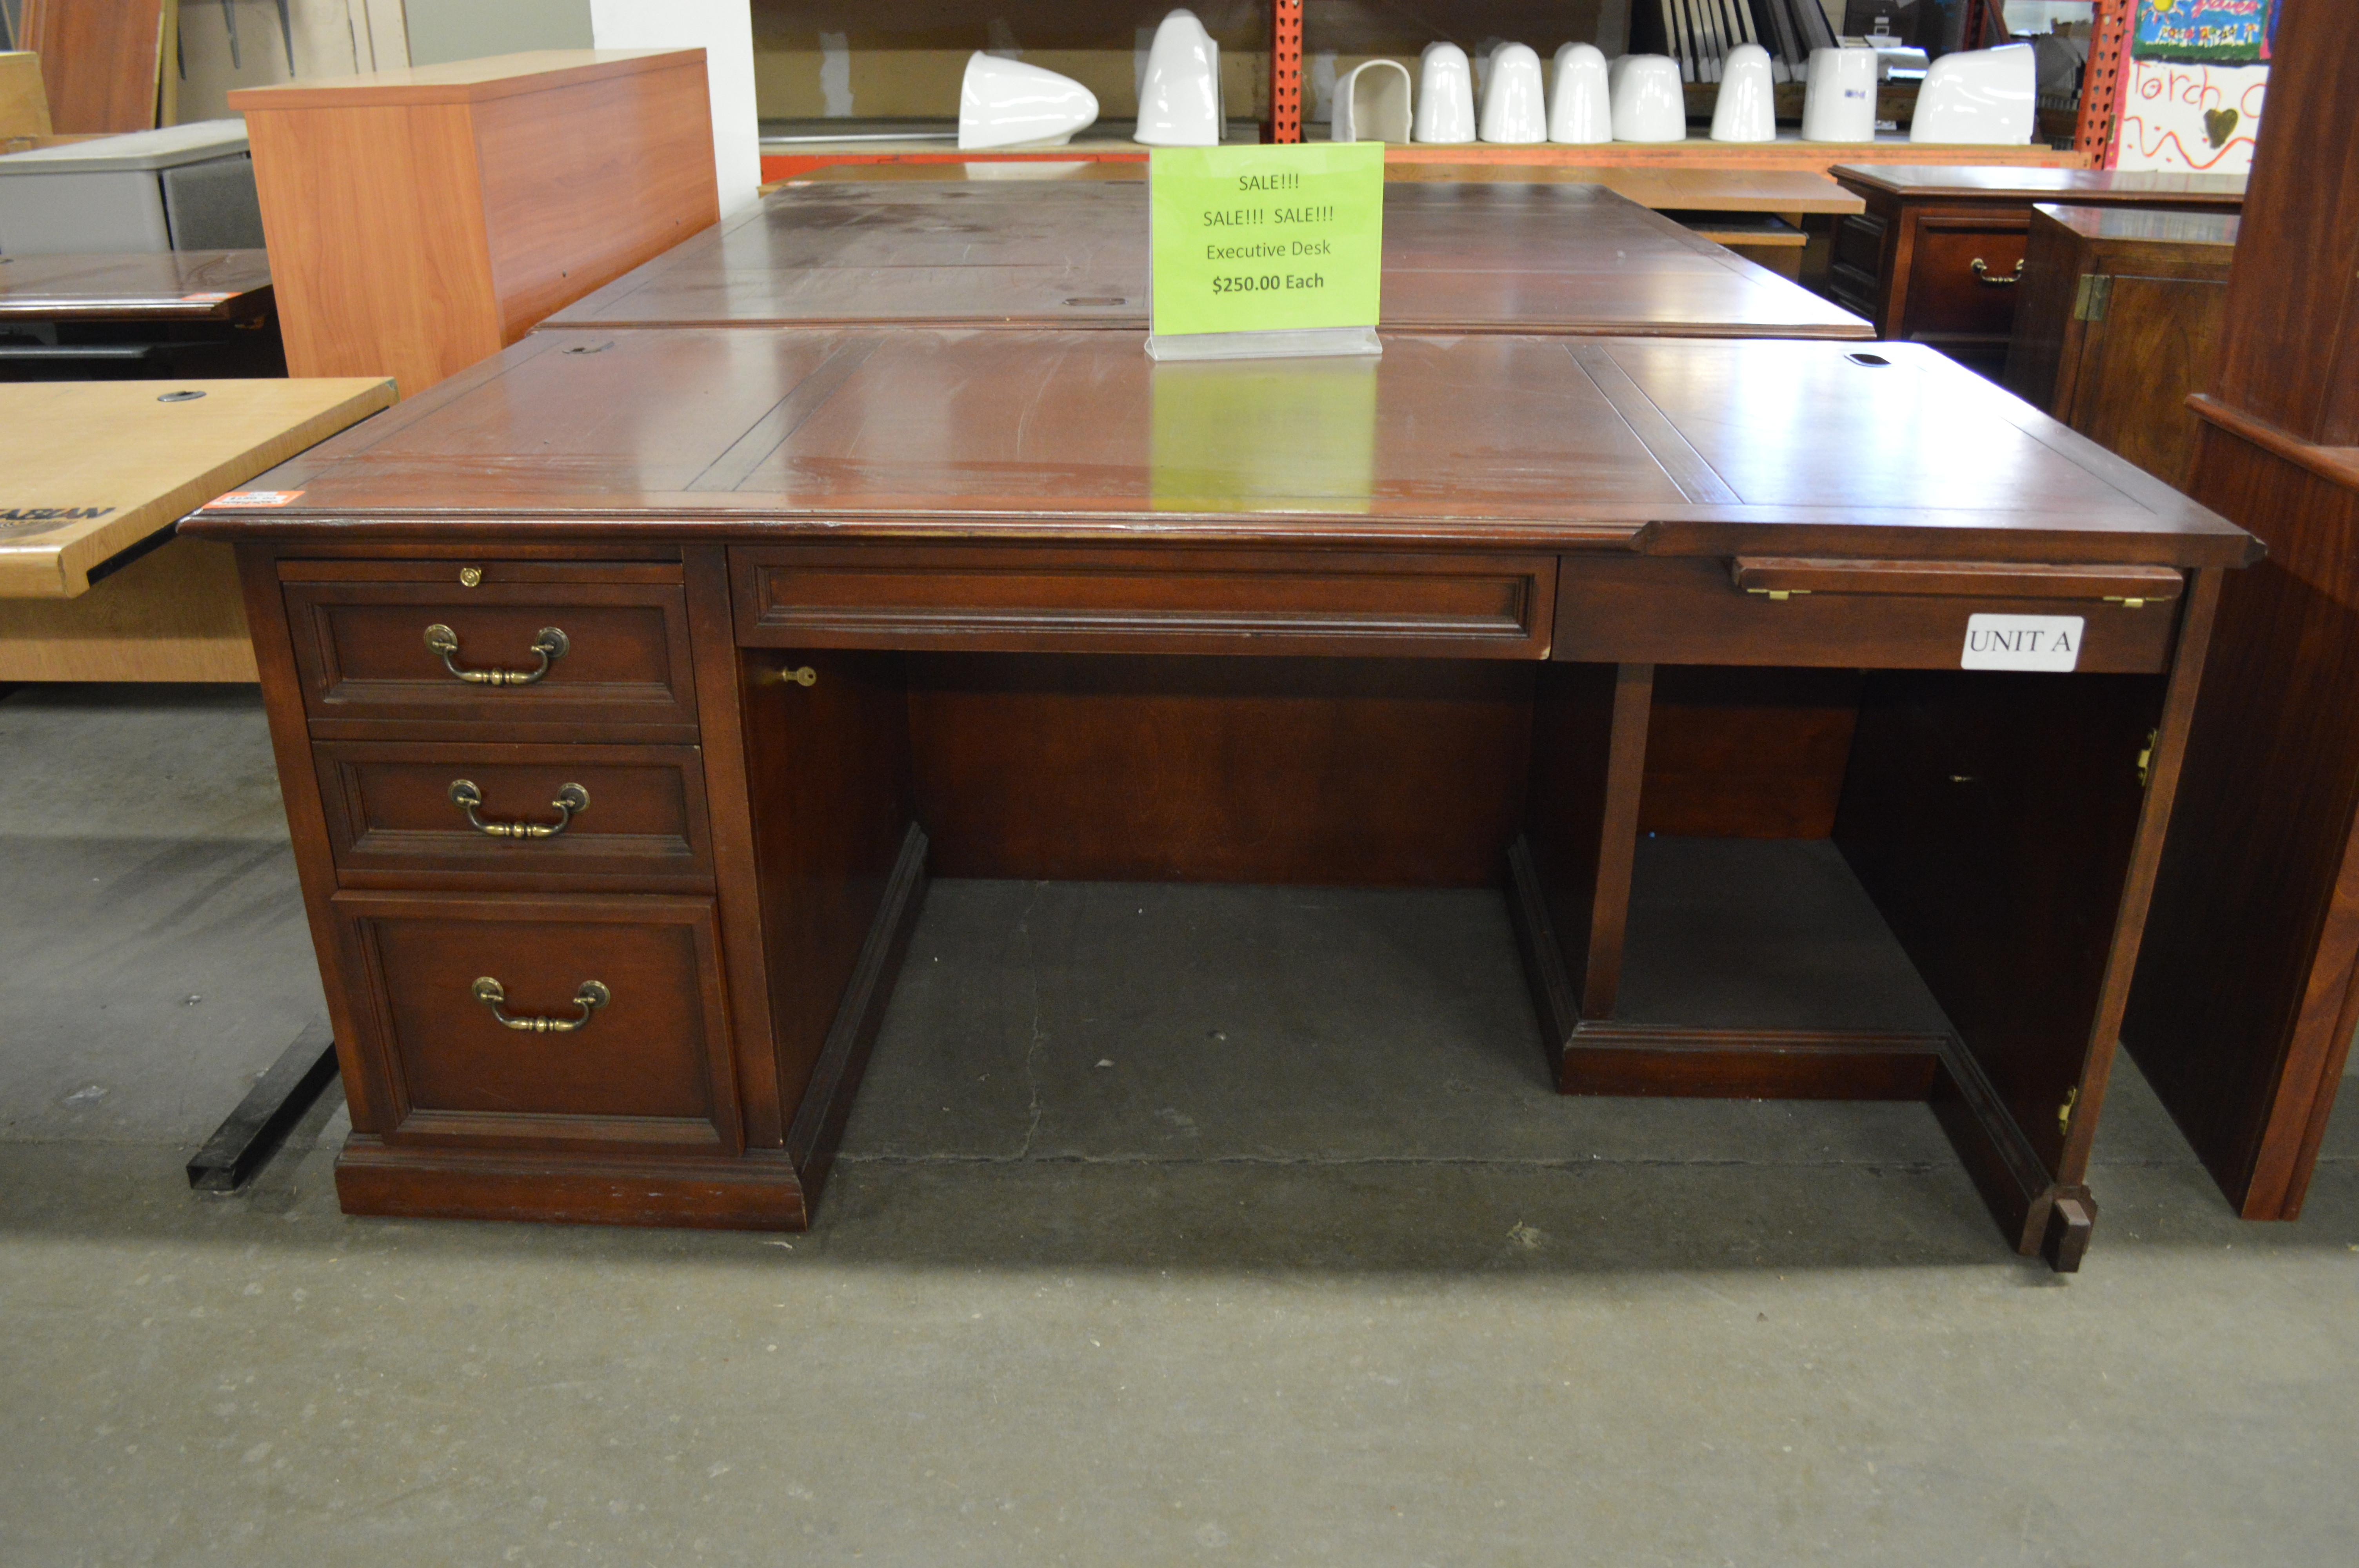 Best ideas about Cheap Office Furniture . Save or Pin Desks Inexpensive Puter Desk Buy fice Desks Desks For Now.